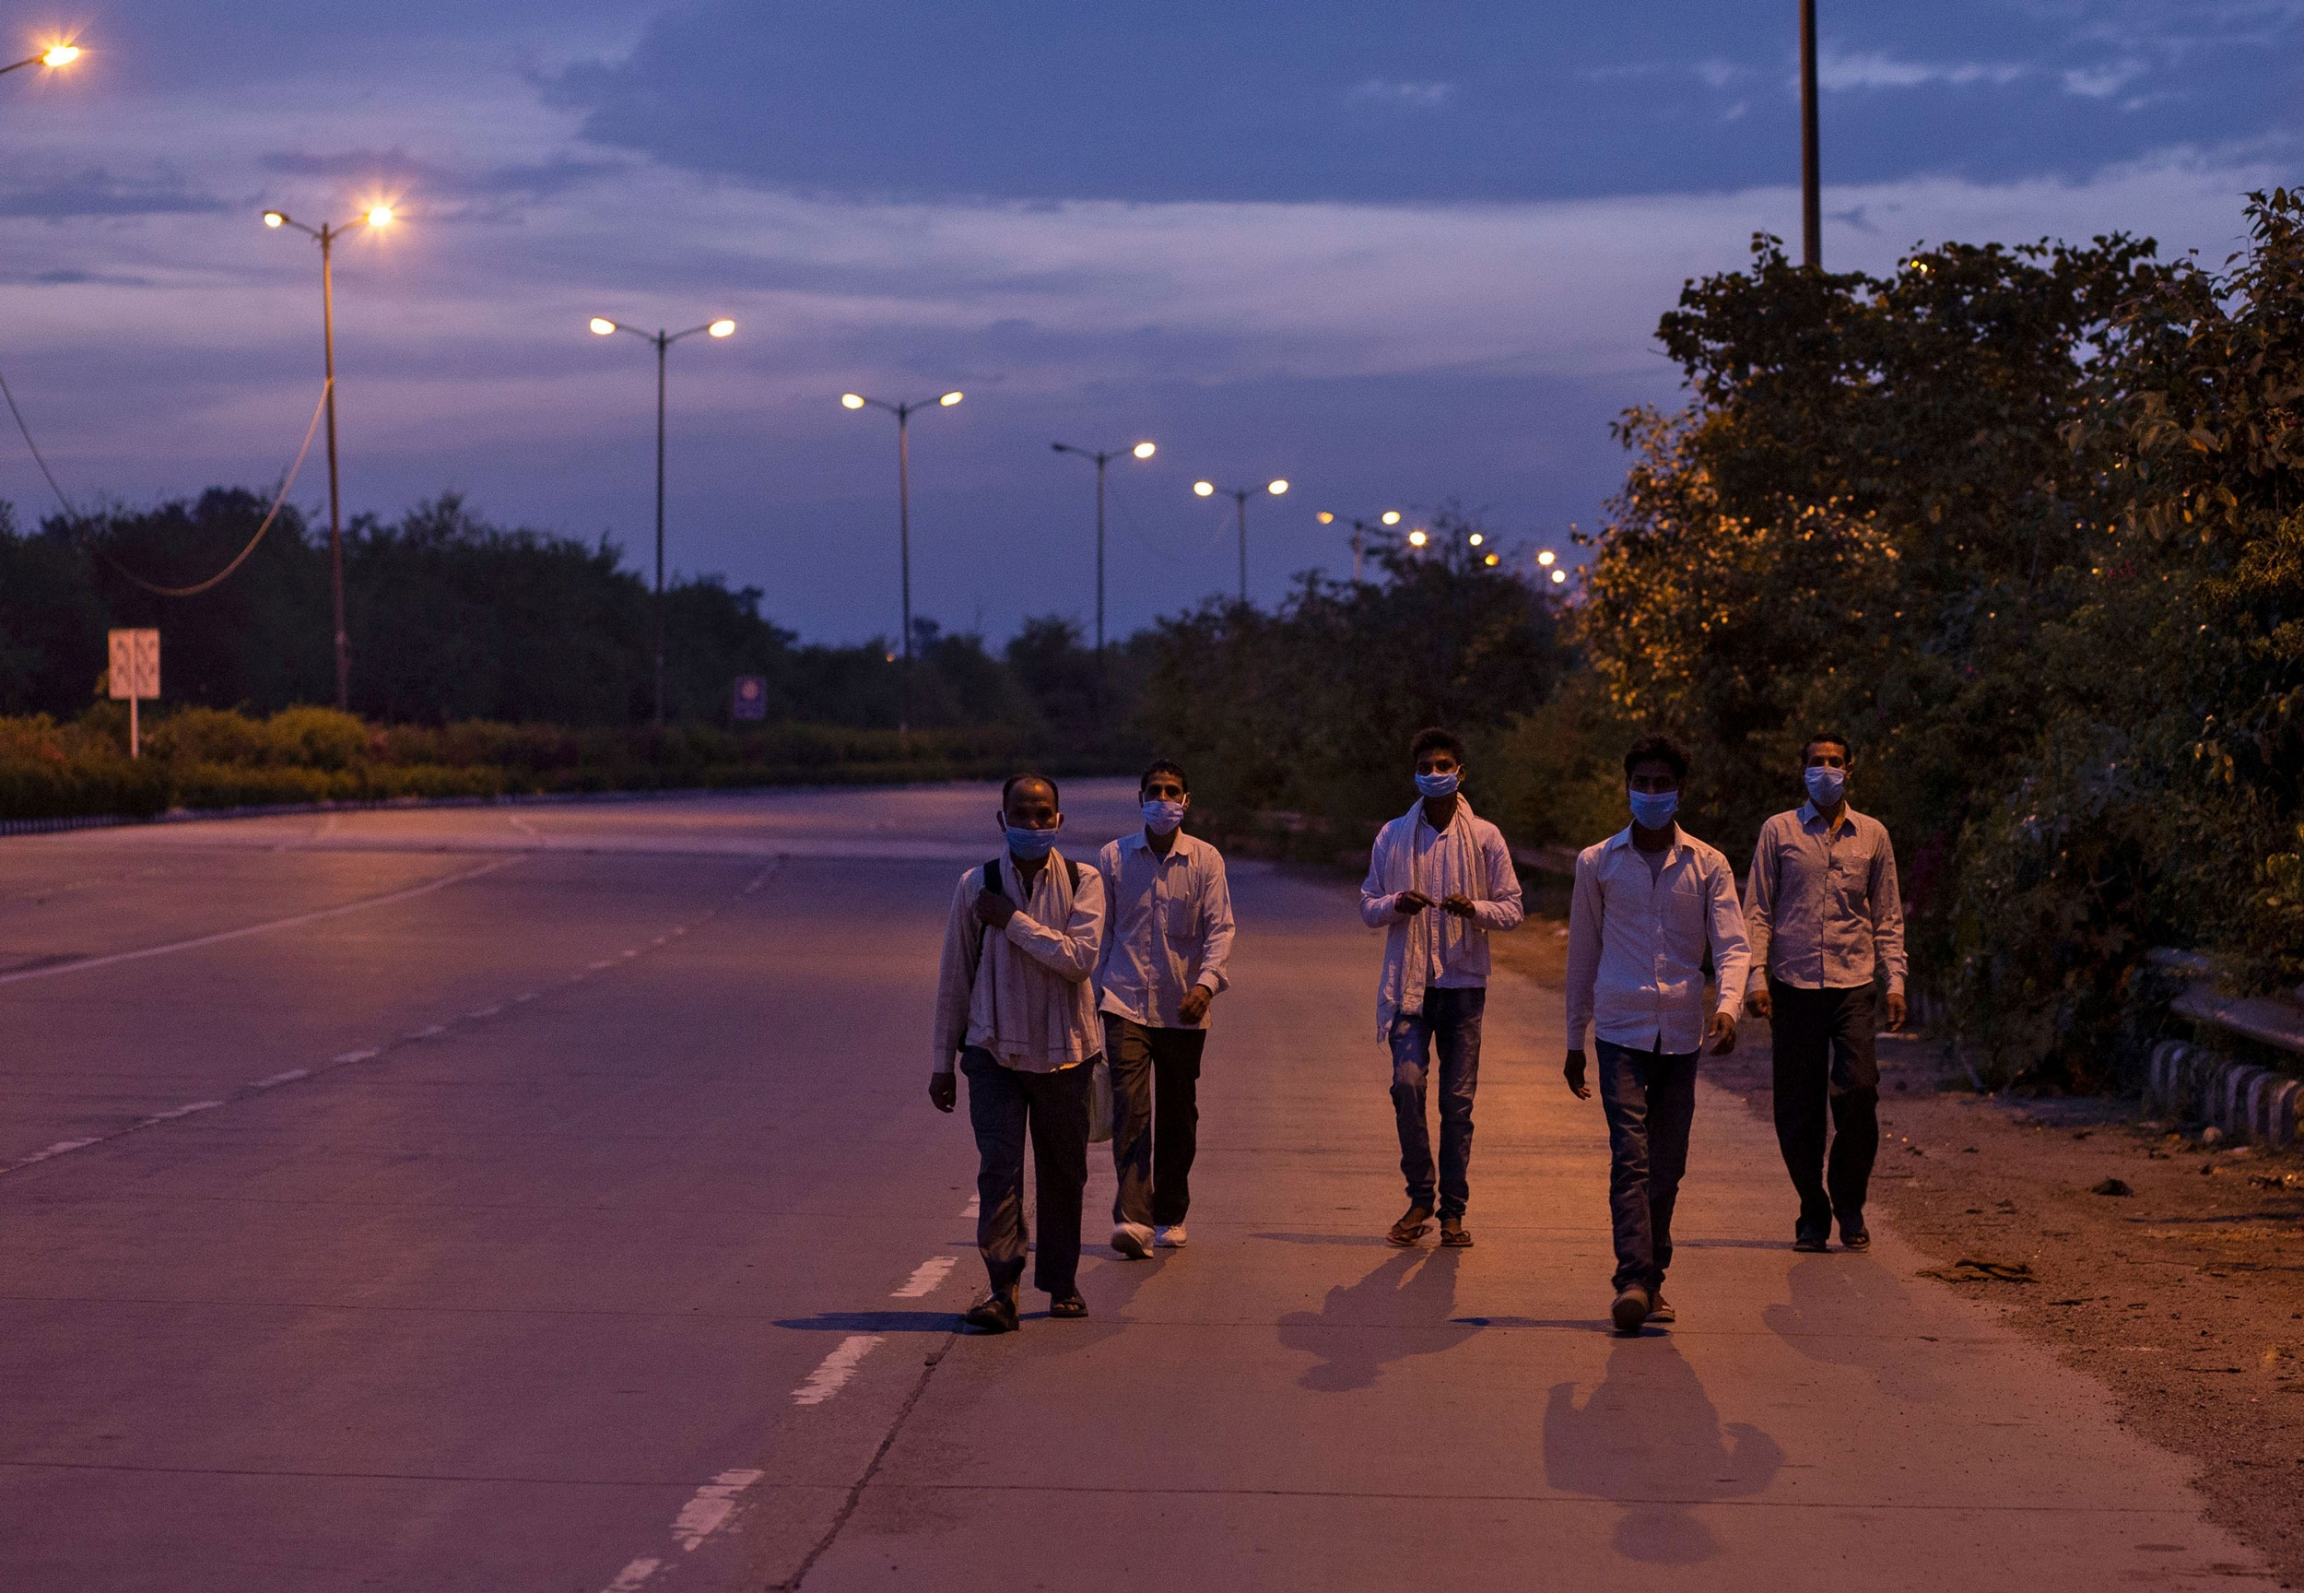 Men walk in twilight